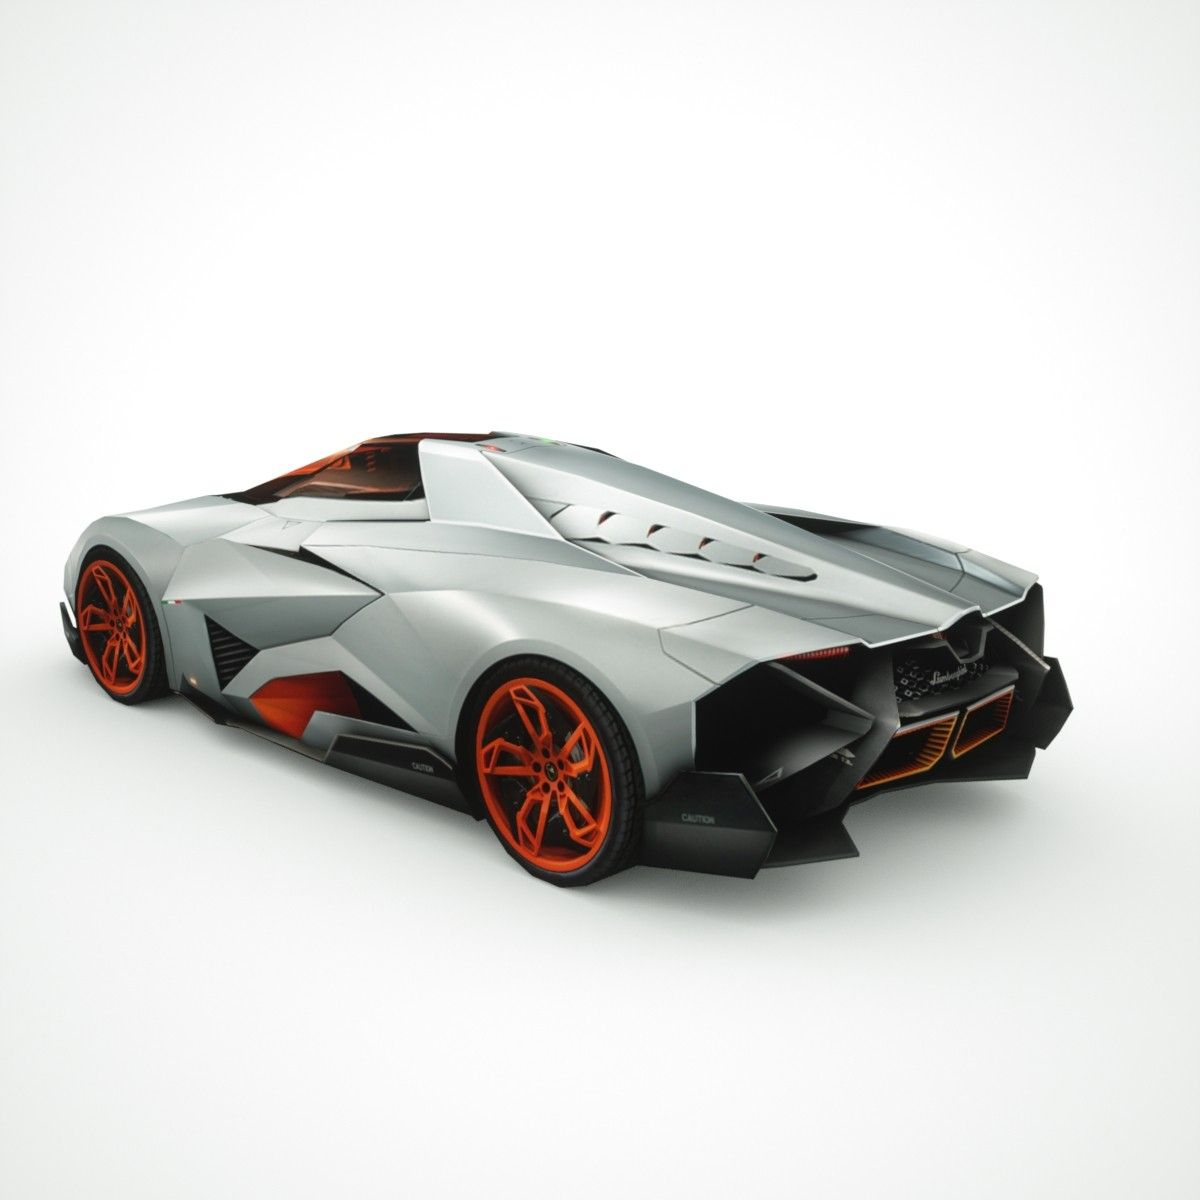 Lamborghini Egoista Concept Car Black: 3d Lamborghini Egoista Model - LGMSports.com